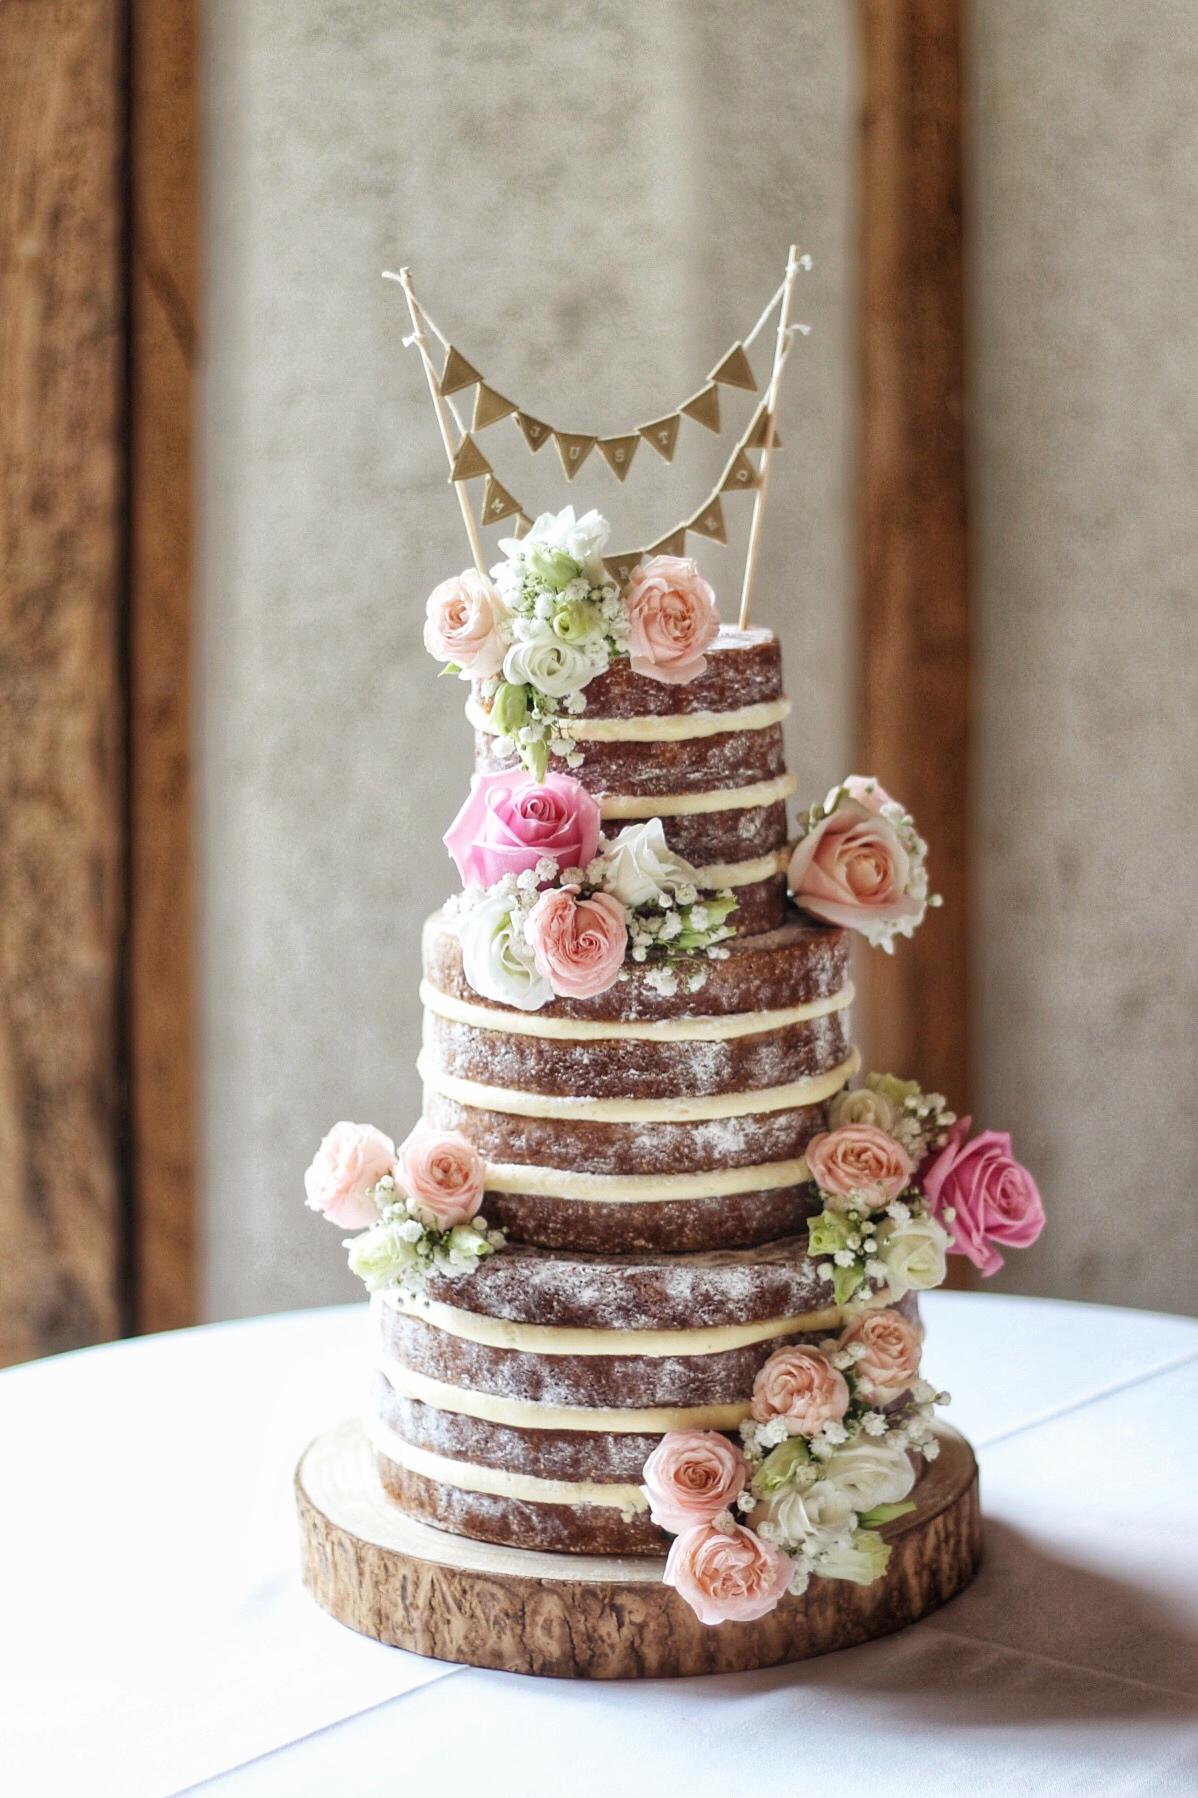 Naked-wedding-cake-SouthendBarns-Chichester.jpg